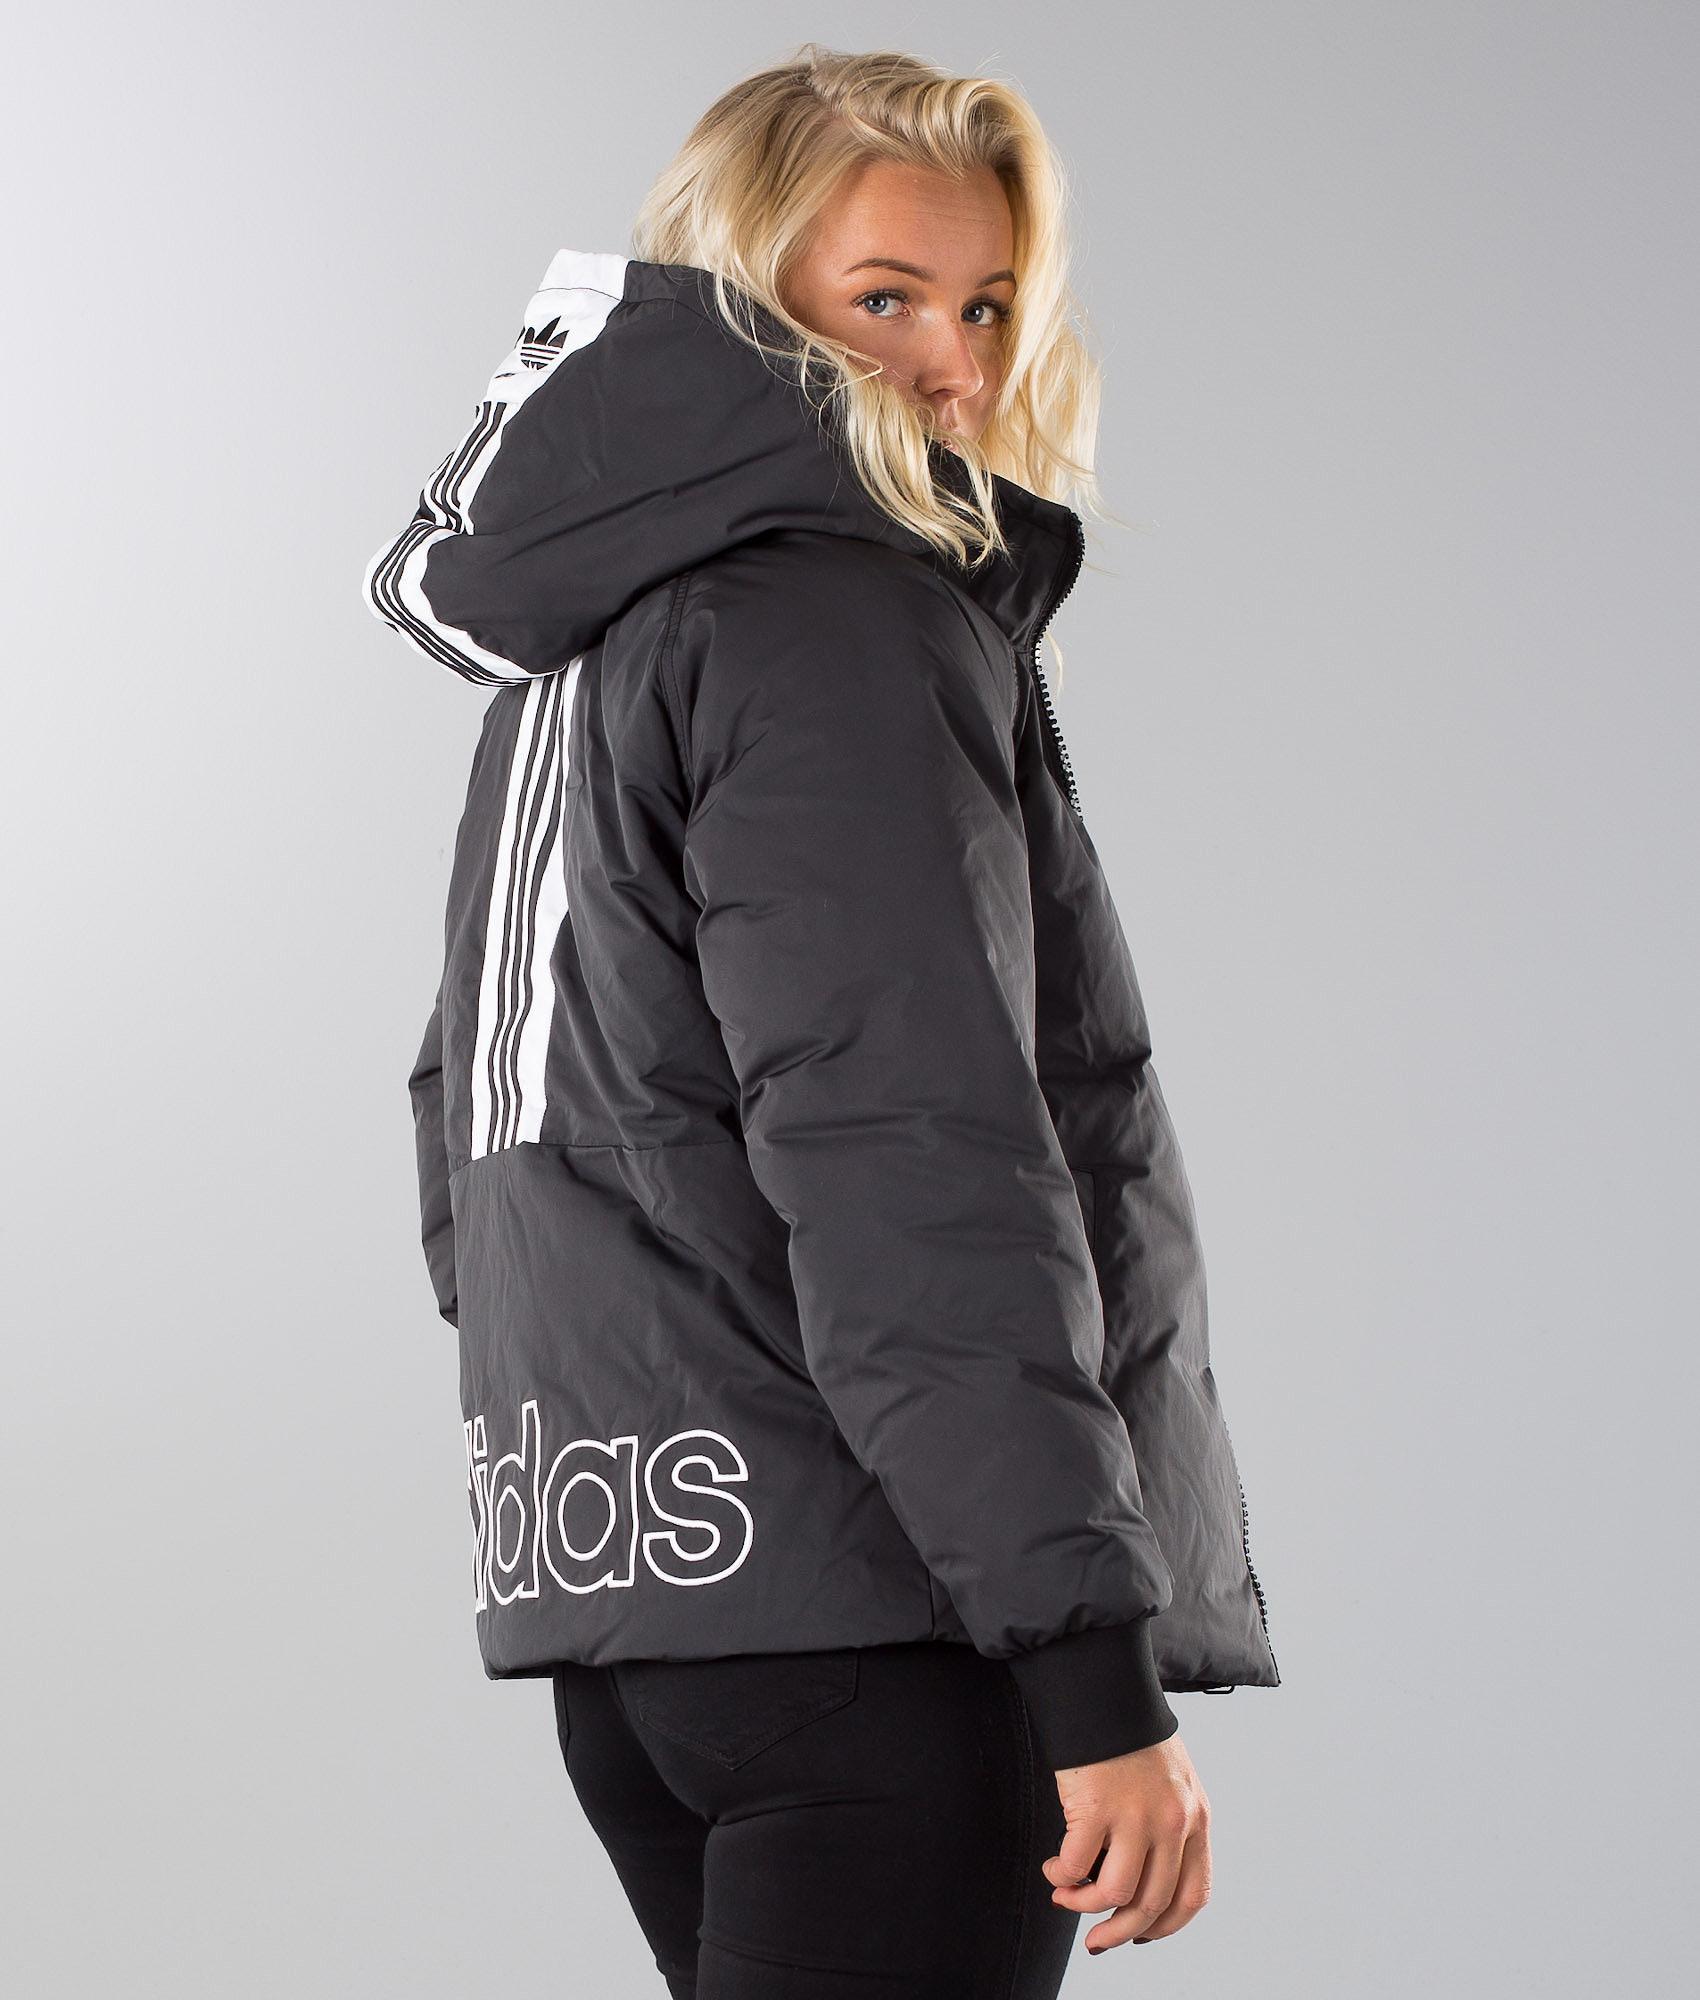 756214165 Adidas Originals Short Down Jacket Black - Ridestore.com